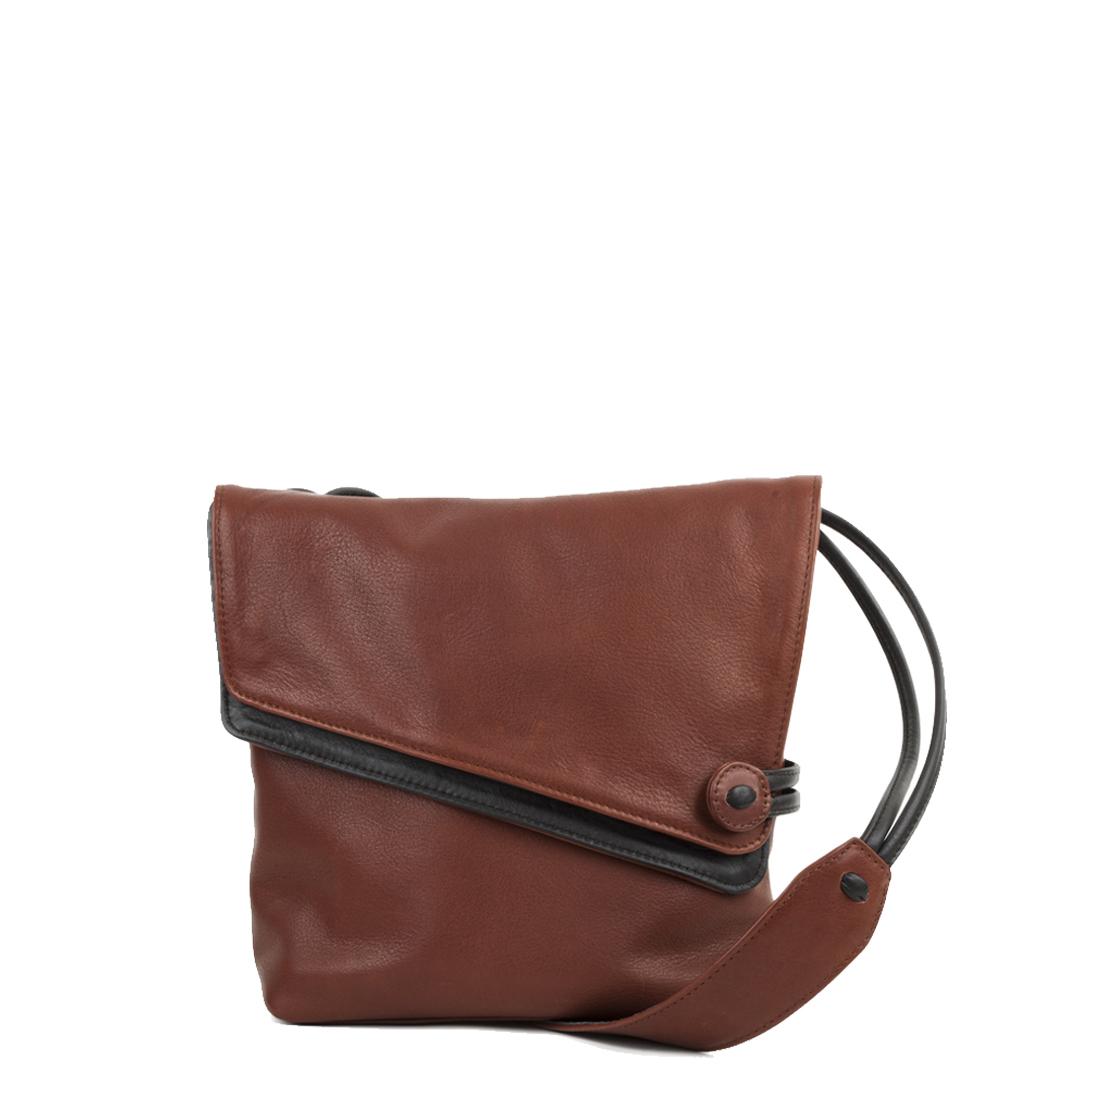 Louise Tan Across Body Leather Bag